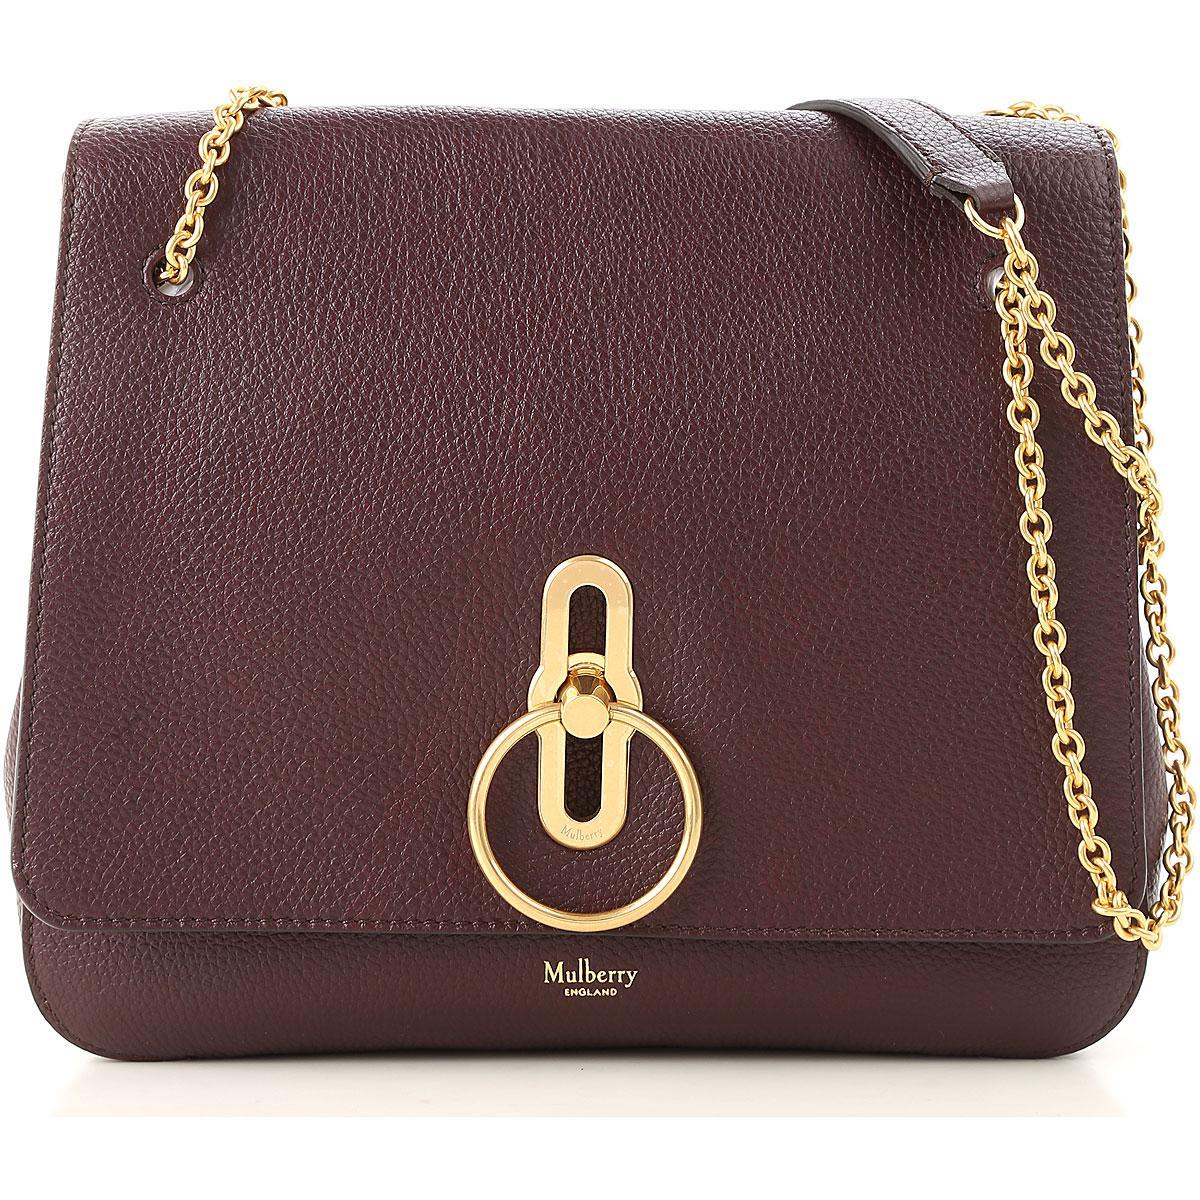 Mulberry - Multicolor Shoulder Bag For Women - Lyst. View fullscreen 9a0efb000d